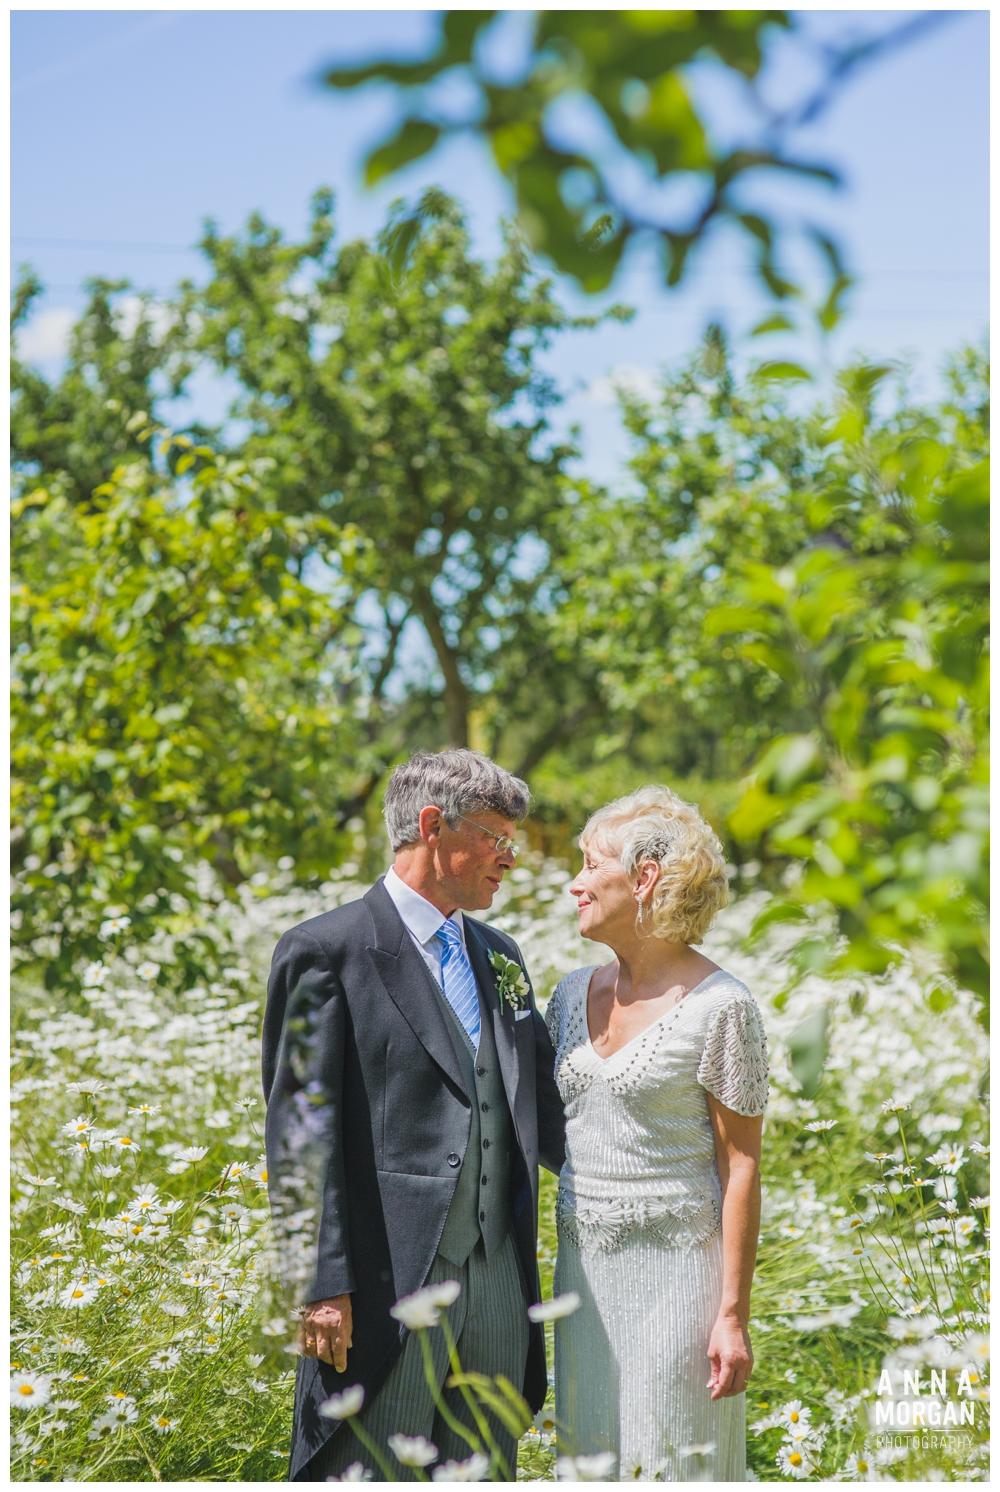 Wimborne Minster & Deans Court Wedding Anna Morgan Photography-41